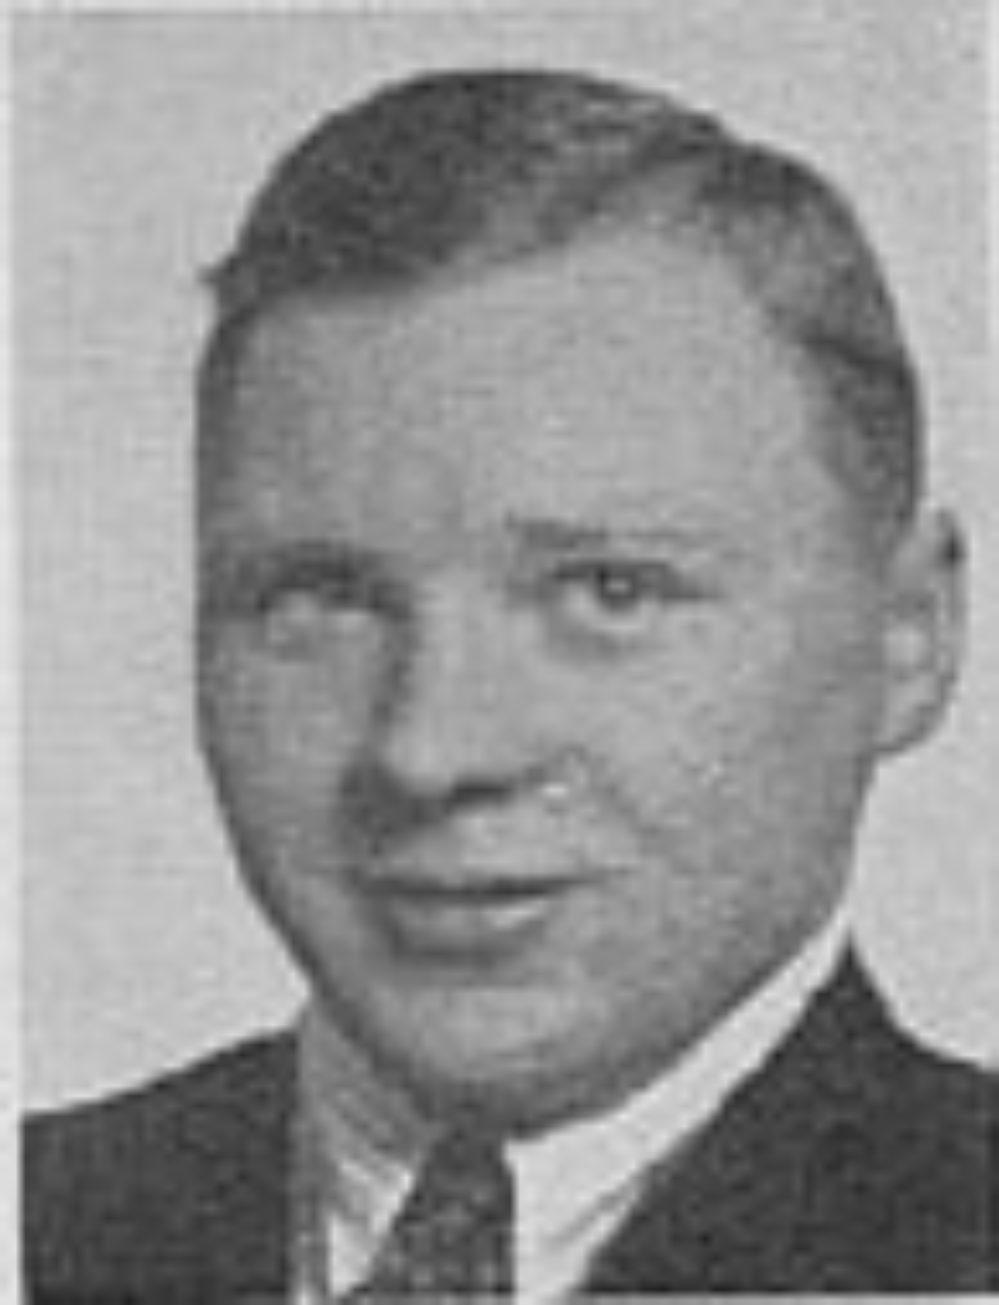 Aage Olsen